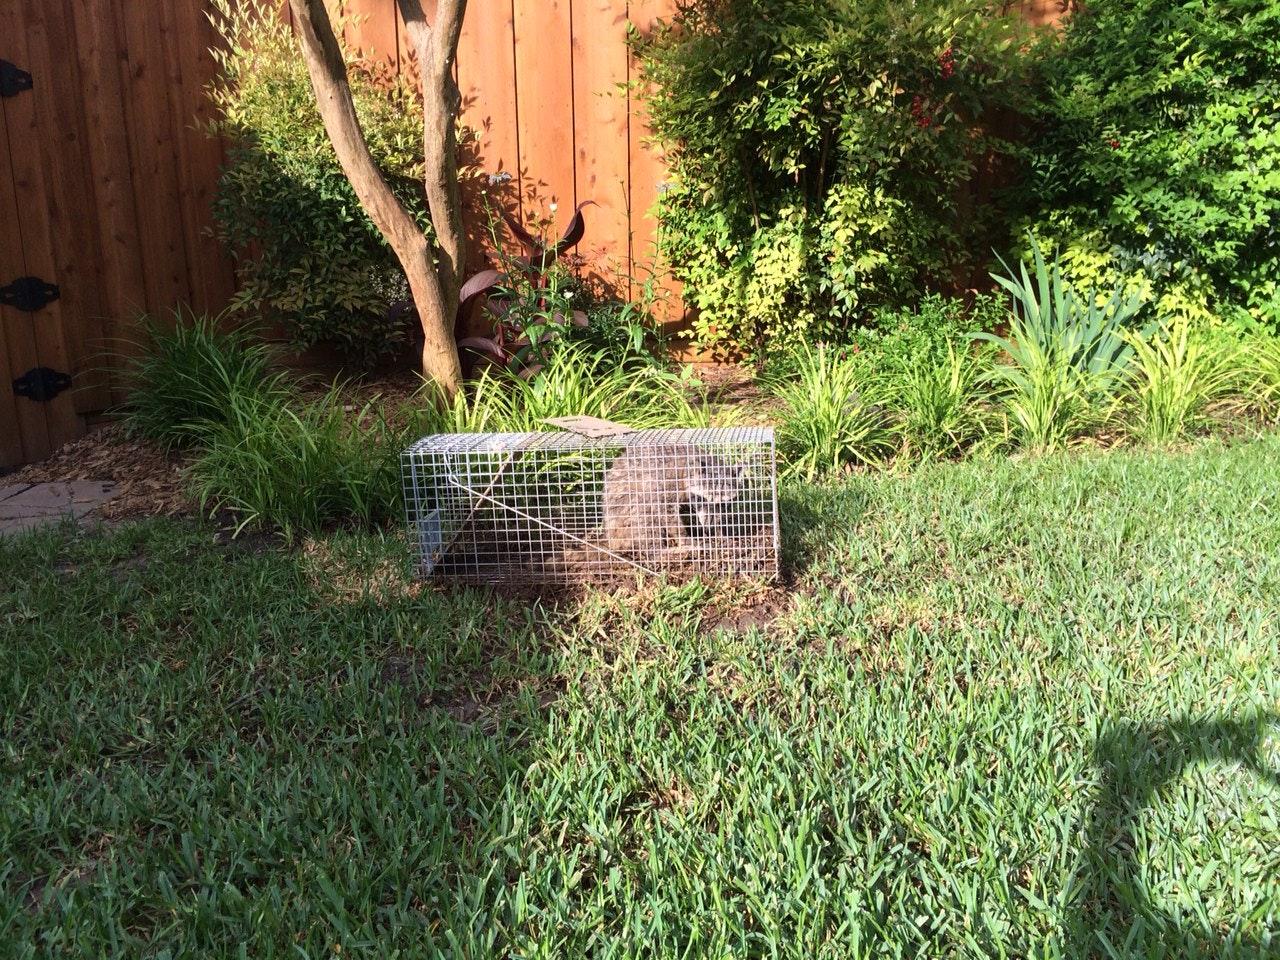 My East Dallas Backyard: The Local Raccoon Latrine Of Choice | Opinion |  Dallas News